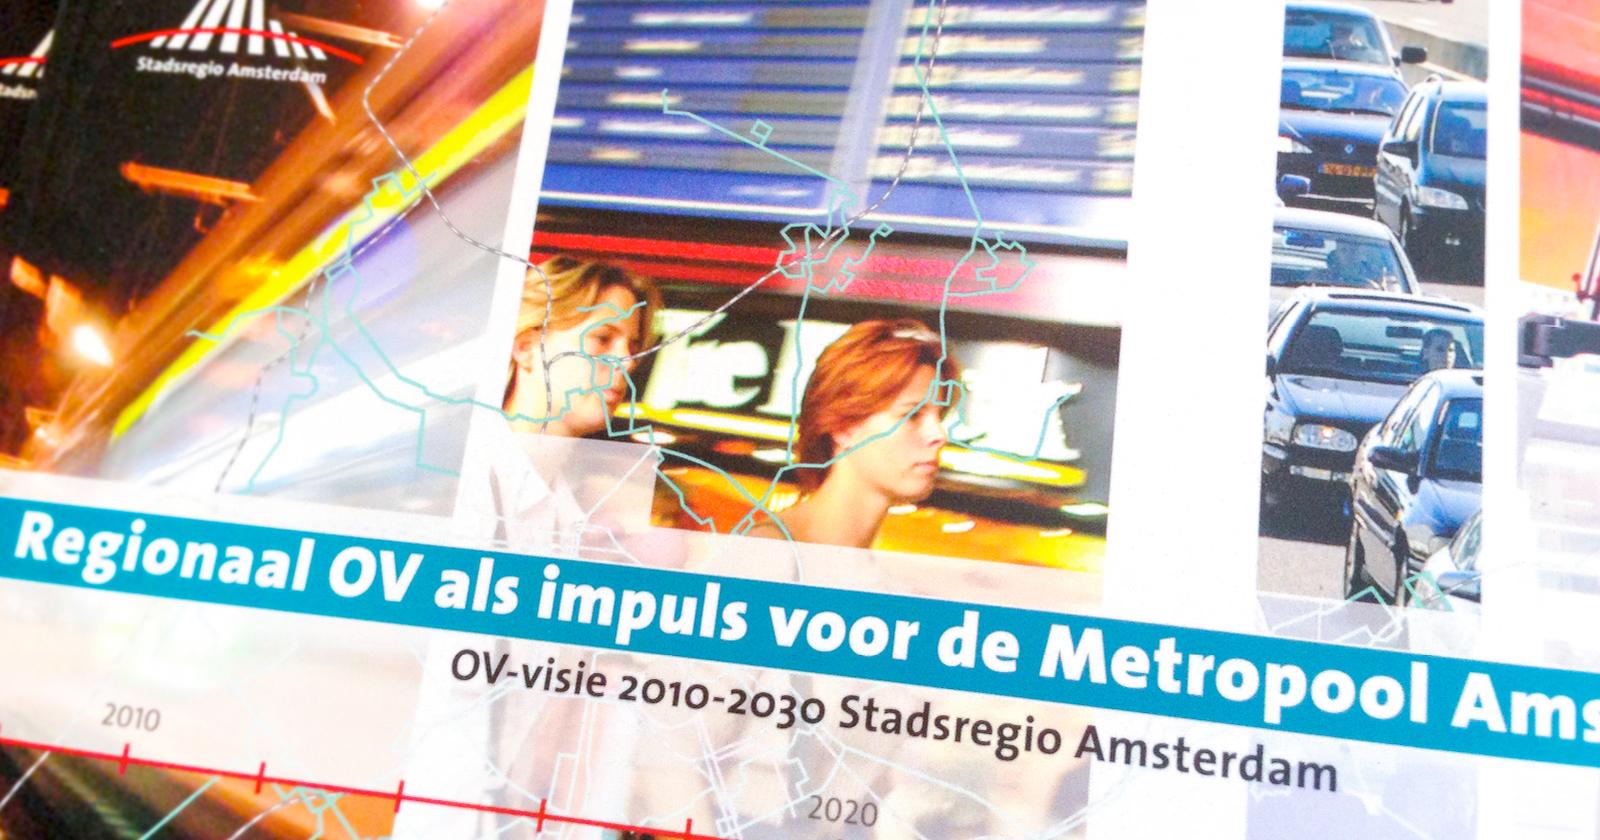 info-cartografics8-StadsregioAmsterdam